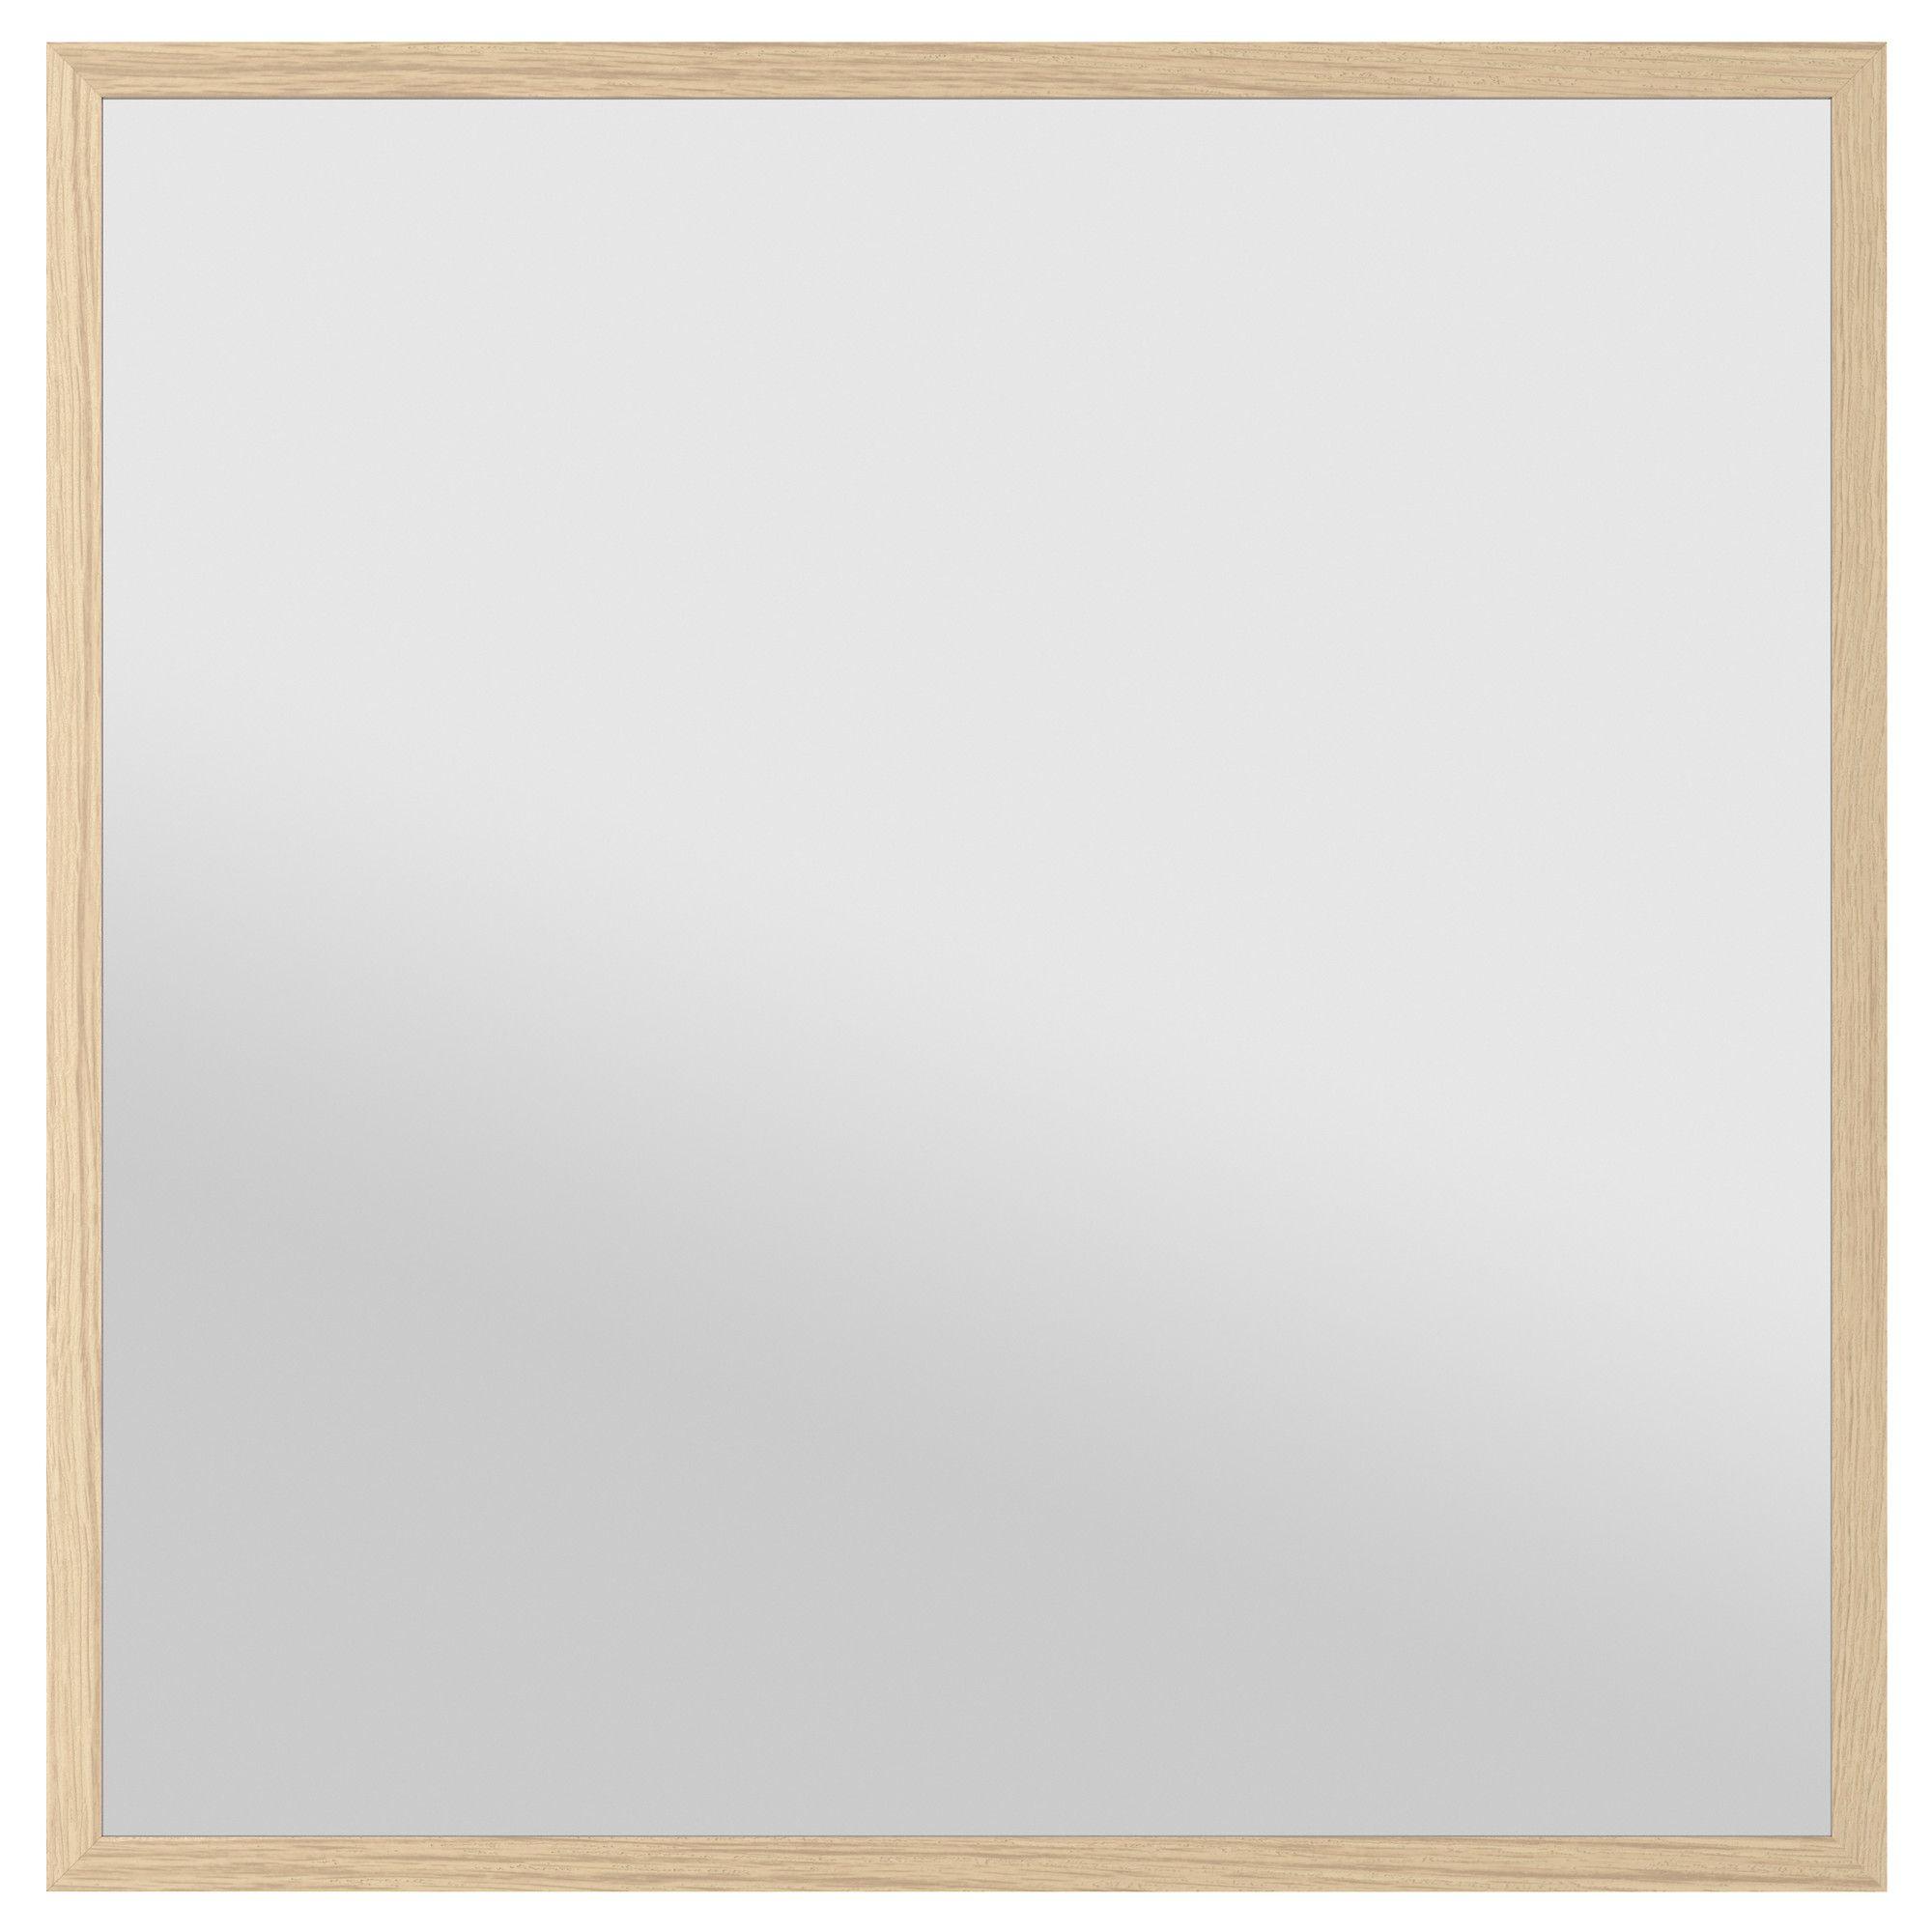 Espejos De Baño En Ikea | Stave Espejo Efecto Roble Tinte Blanco Ikea Espejo Bano Ikea